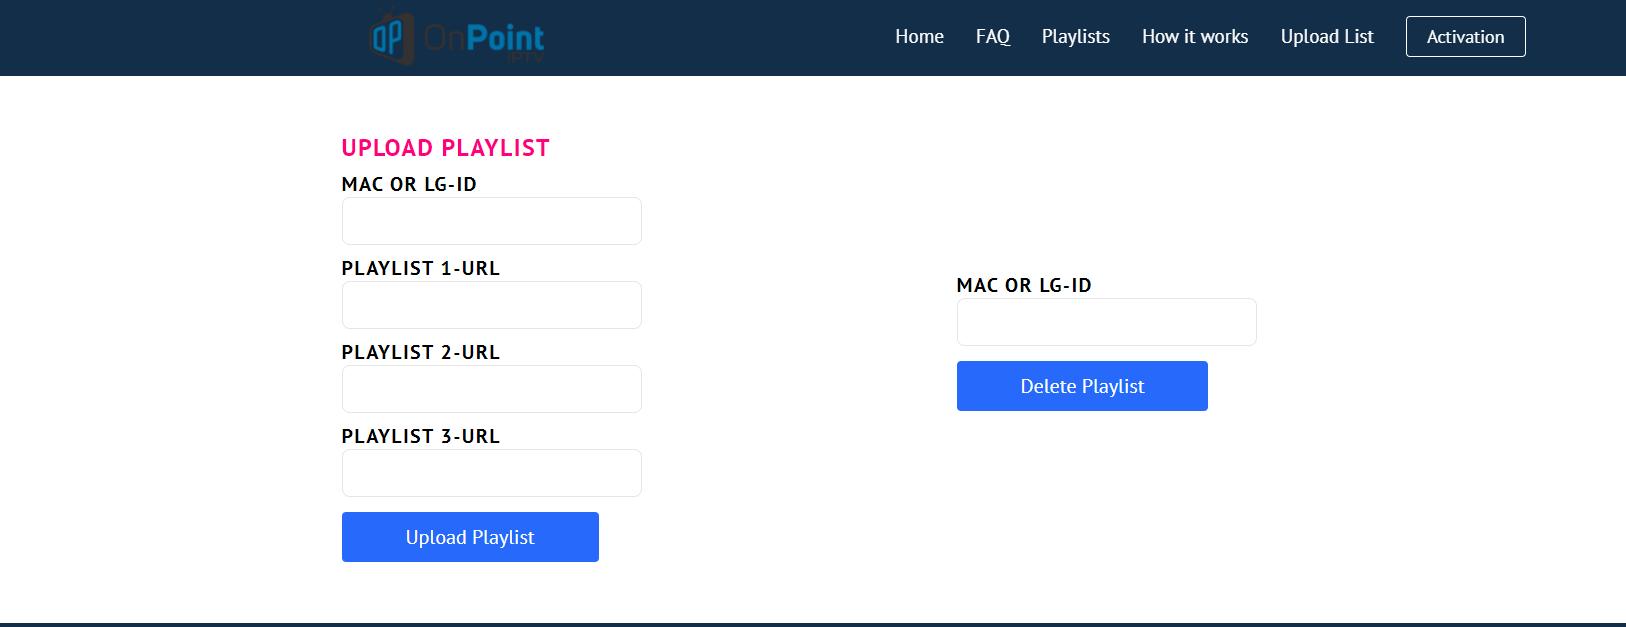 onpoint iptv app